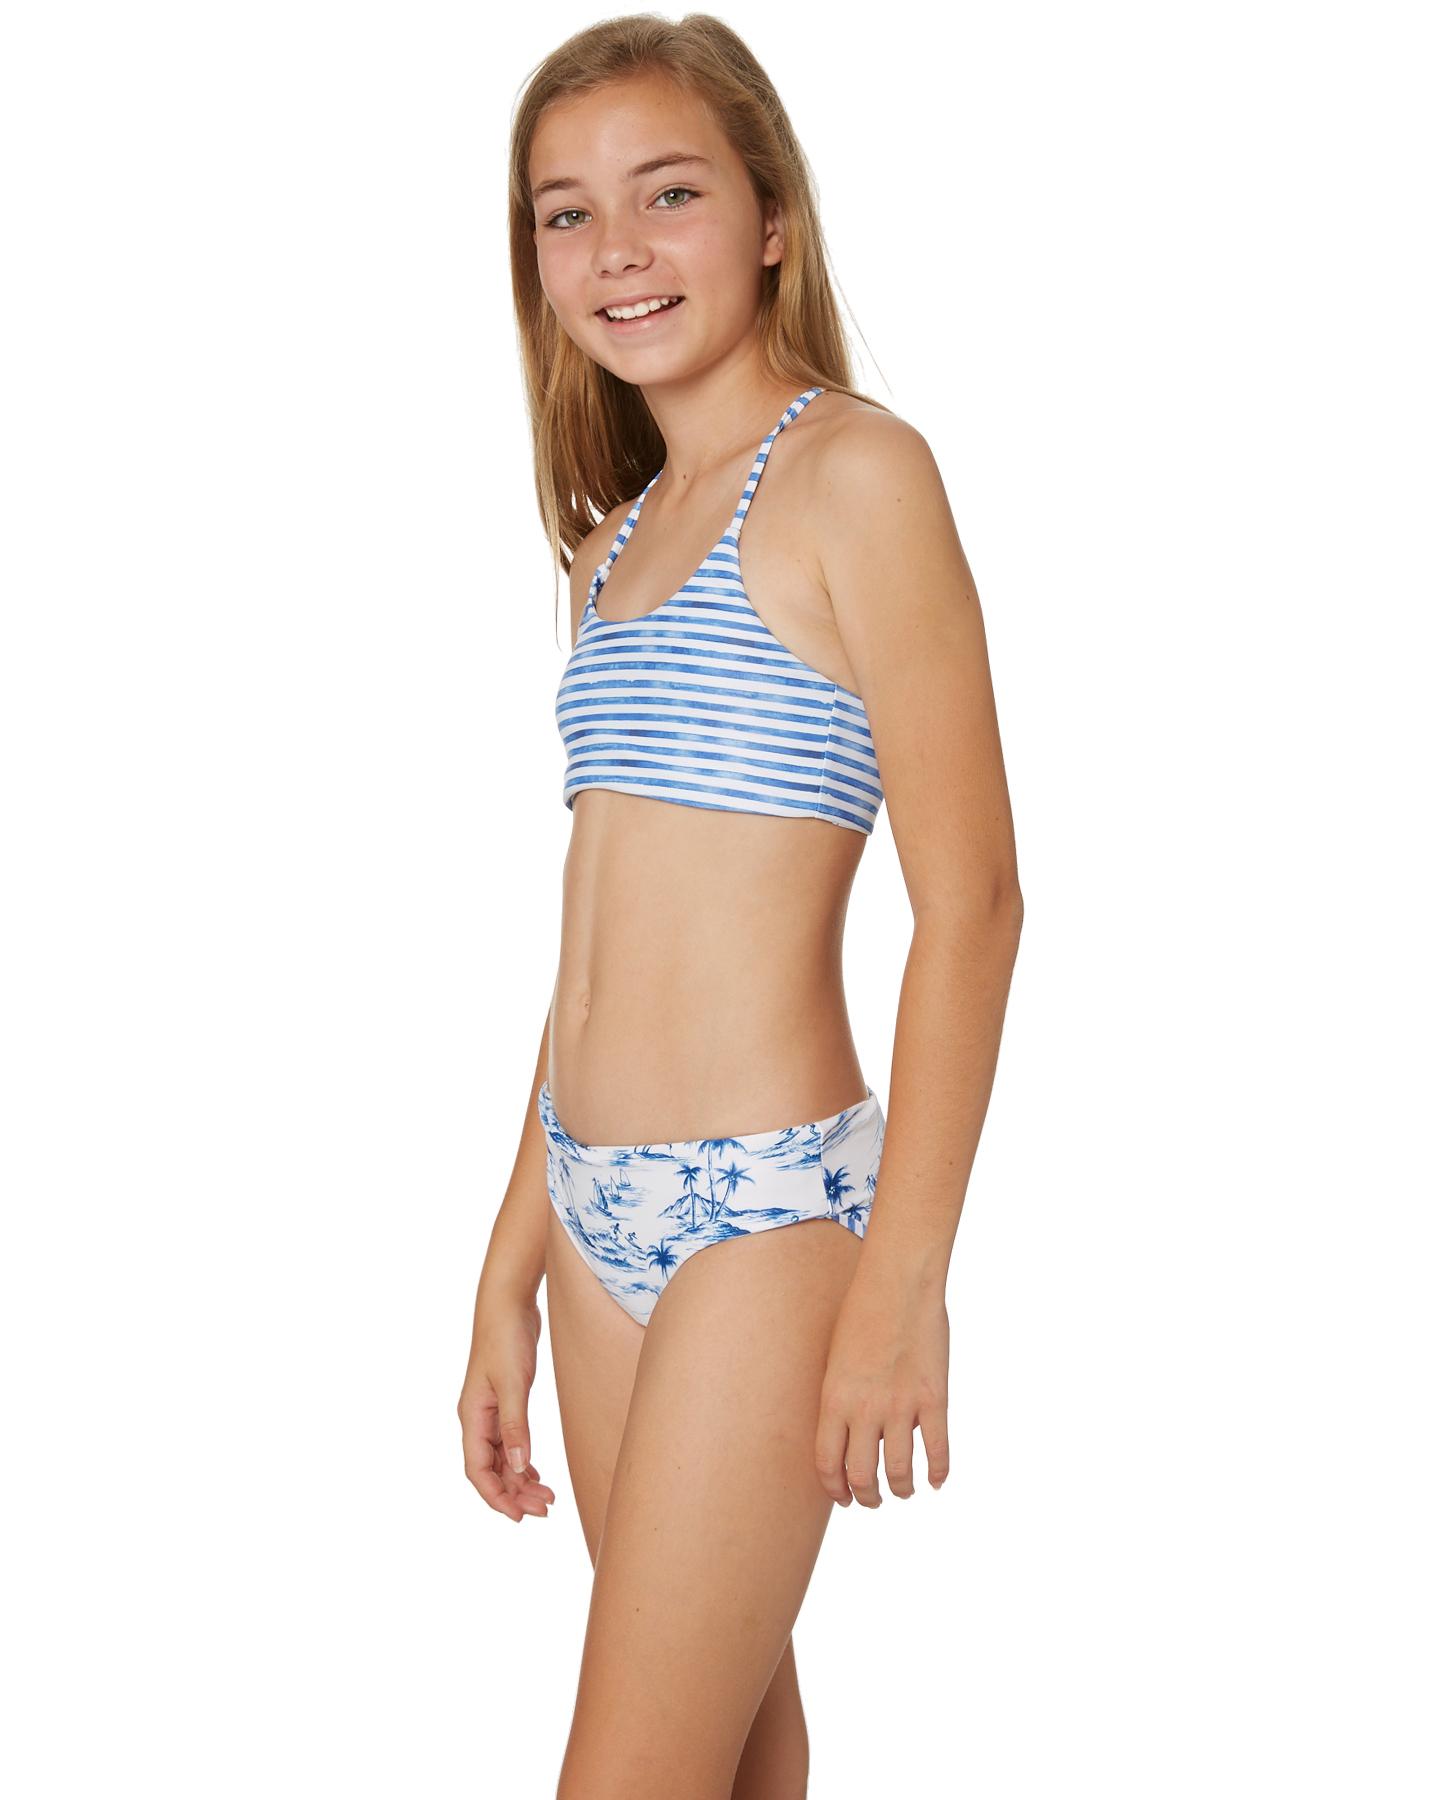 ea43d72c277c4 Seafolly Girls Tropical Vibes Reversible Tankini - White Blue ...